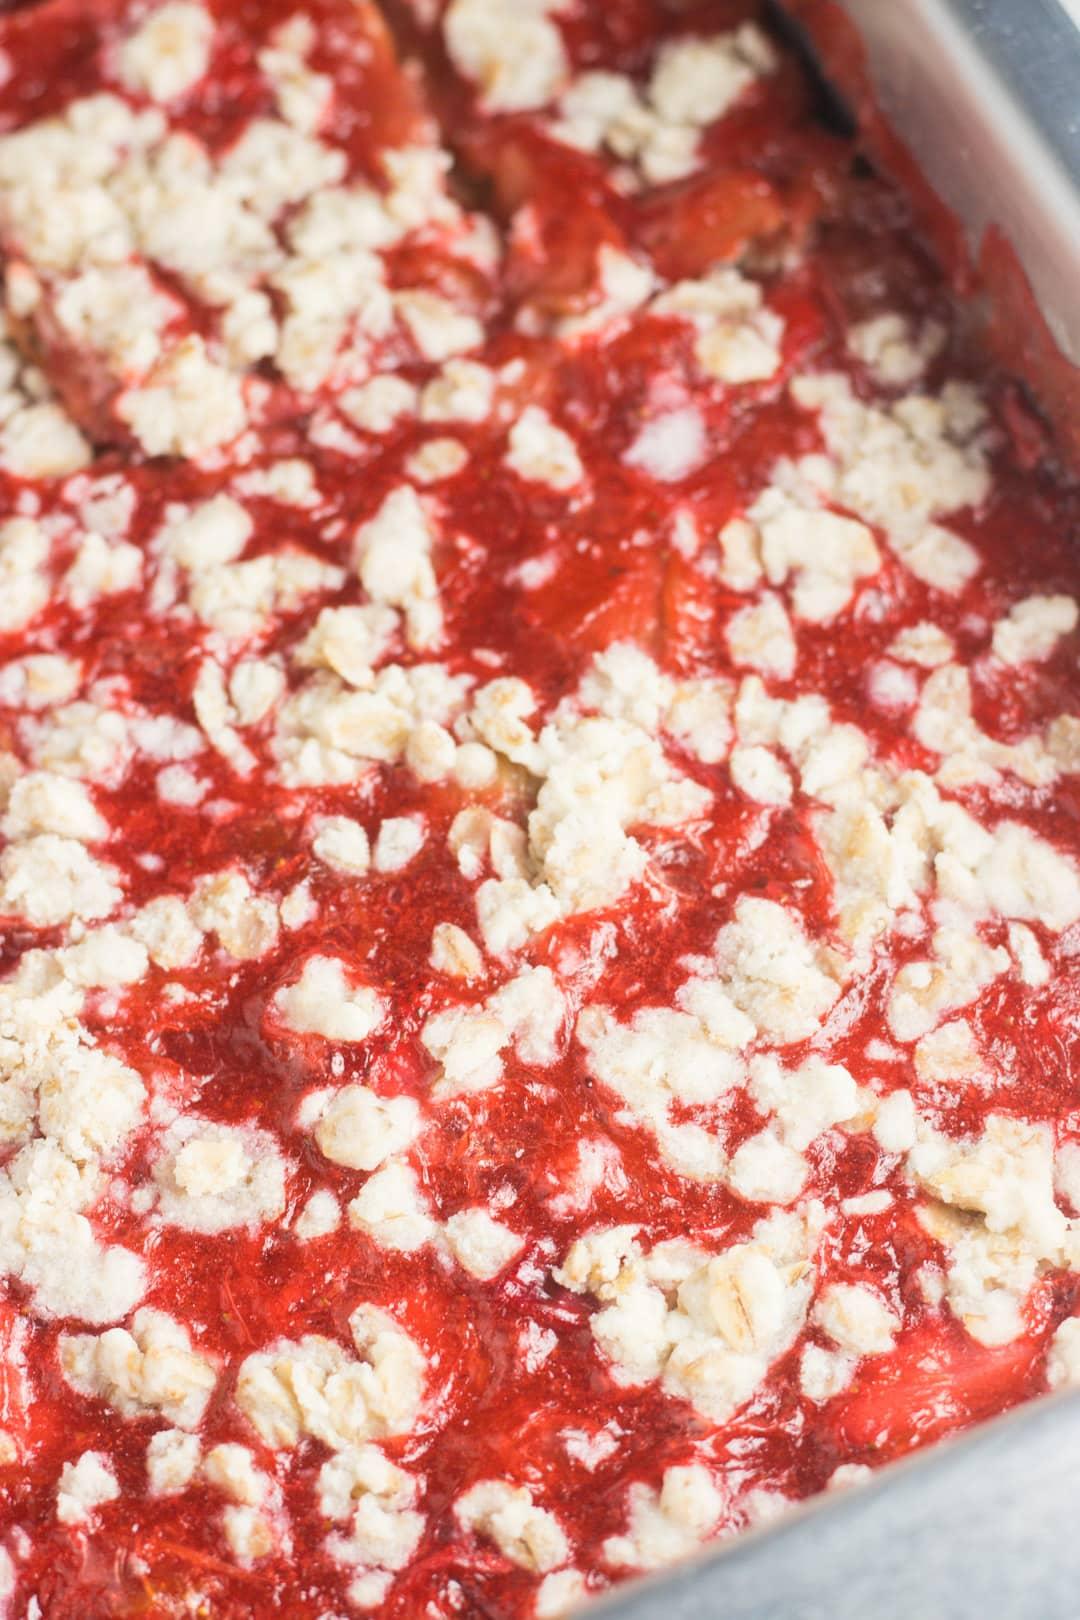 Pan of low FODMAP rhubarb strawberry crumble